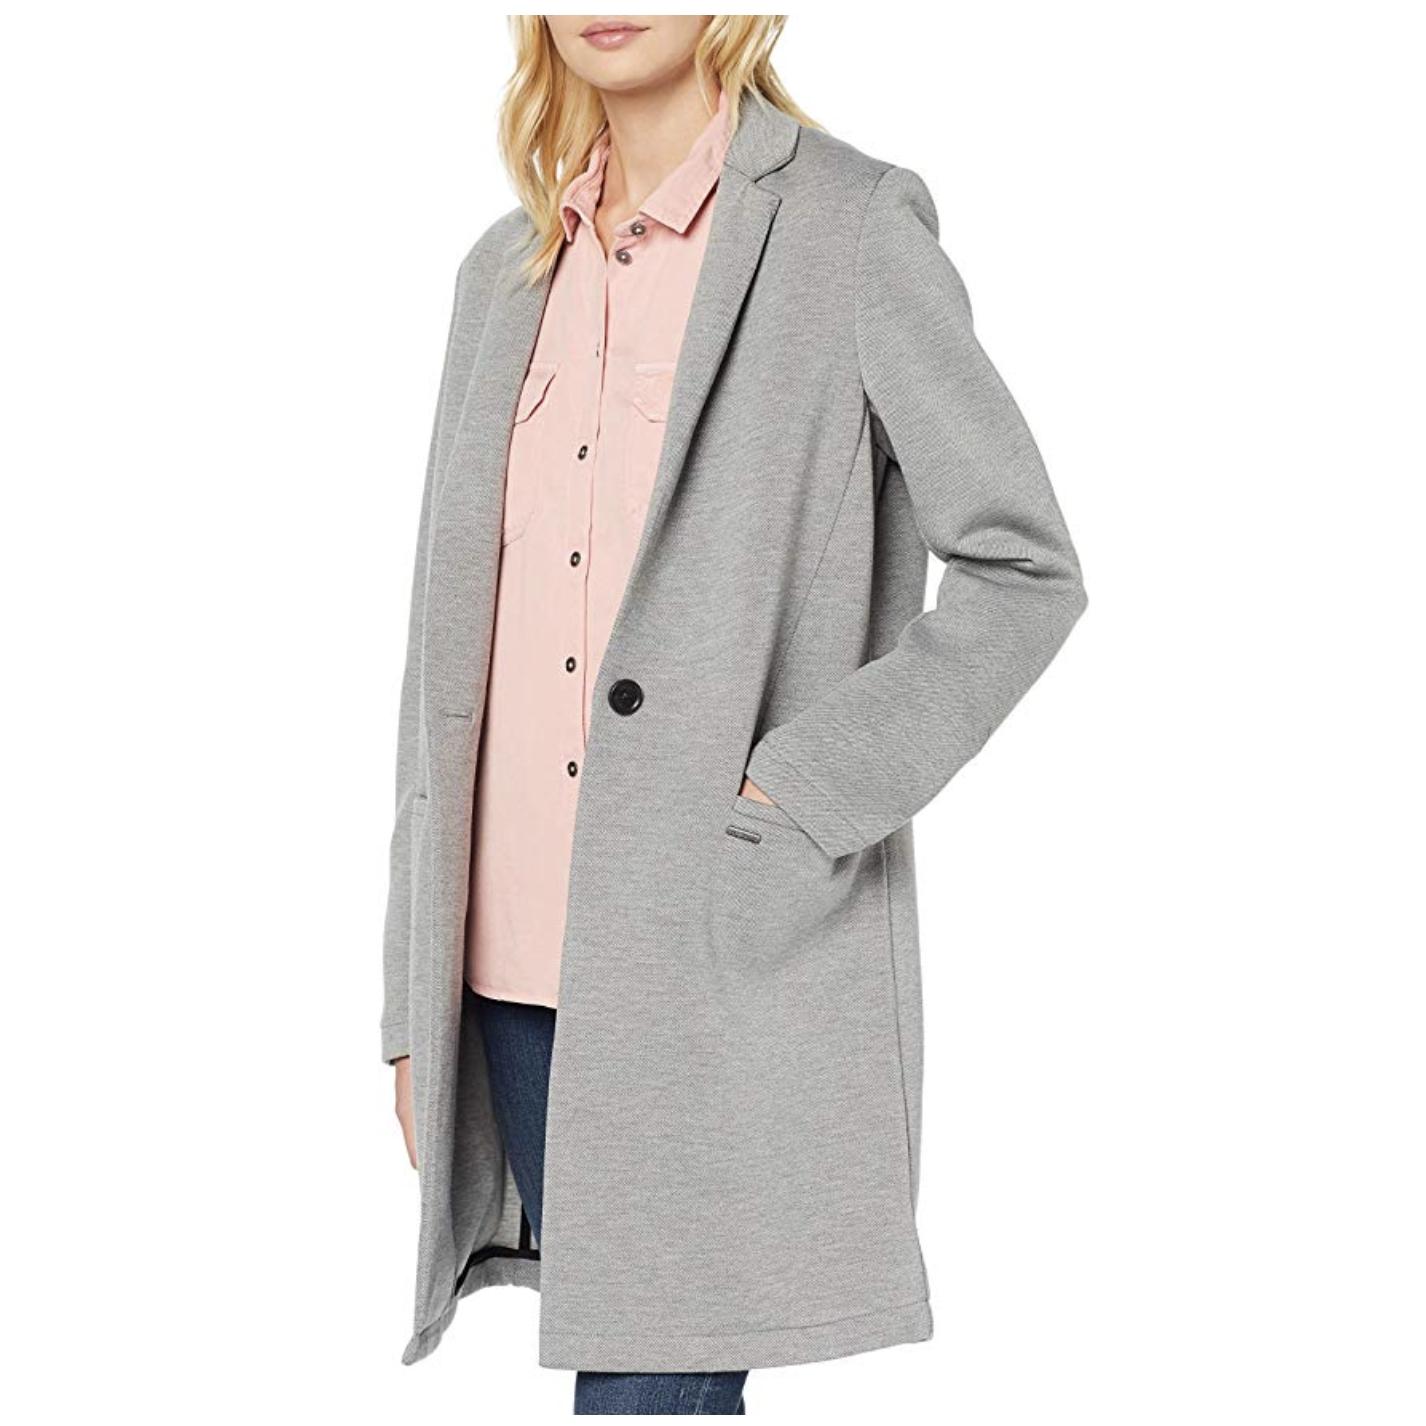 Superdry 极度干燥 Azure 女士中长款风衣外套